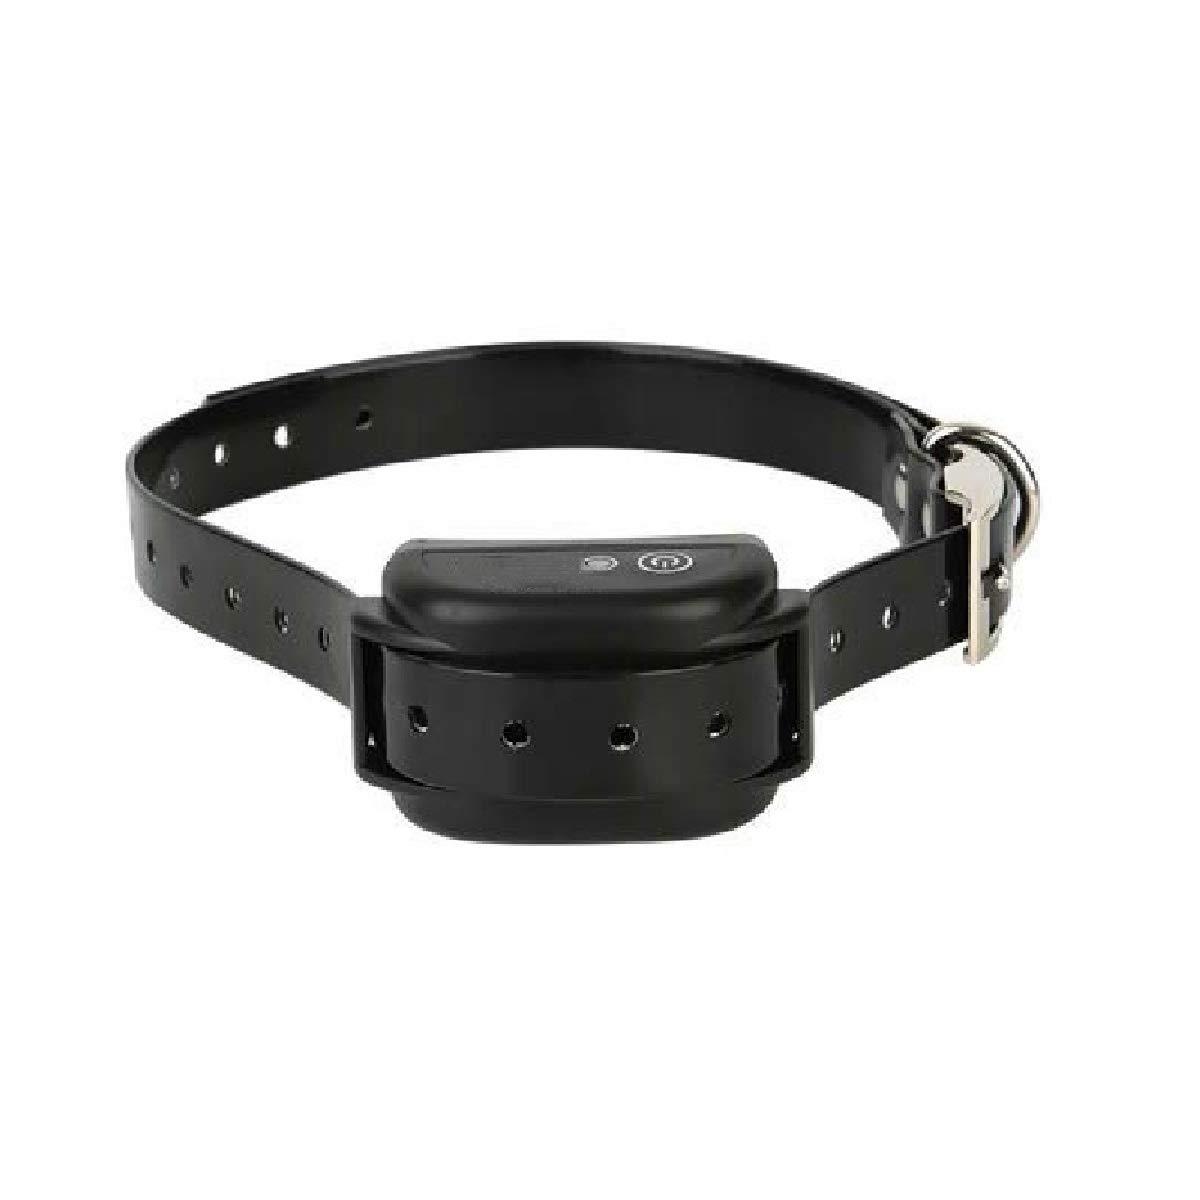 FunAce Extra Wireless Collar Receiver Model  135 Wireless Dog Fence System Collar Receiver